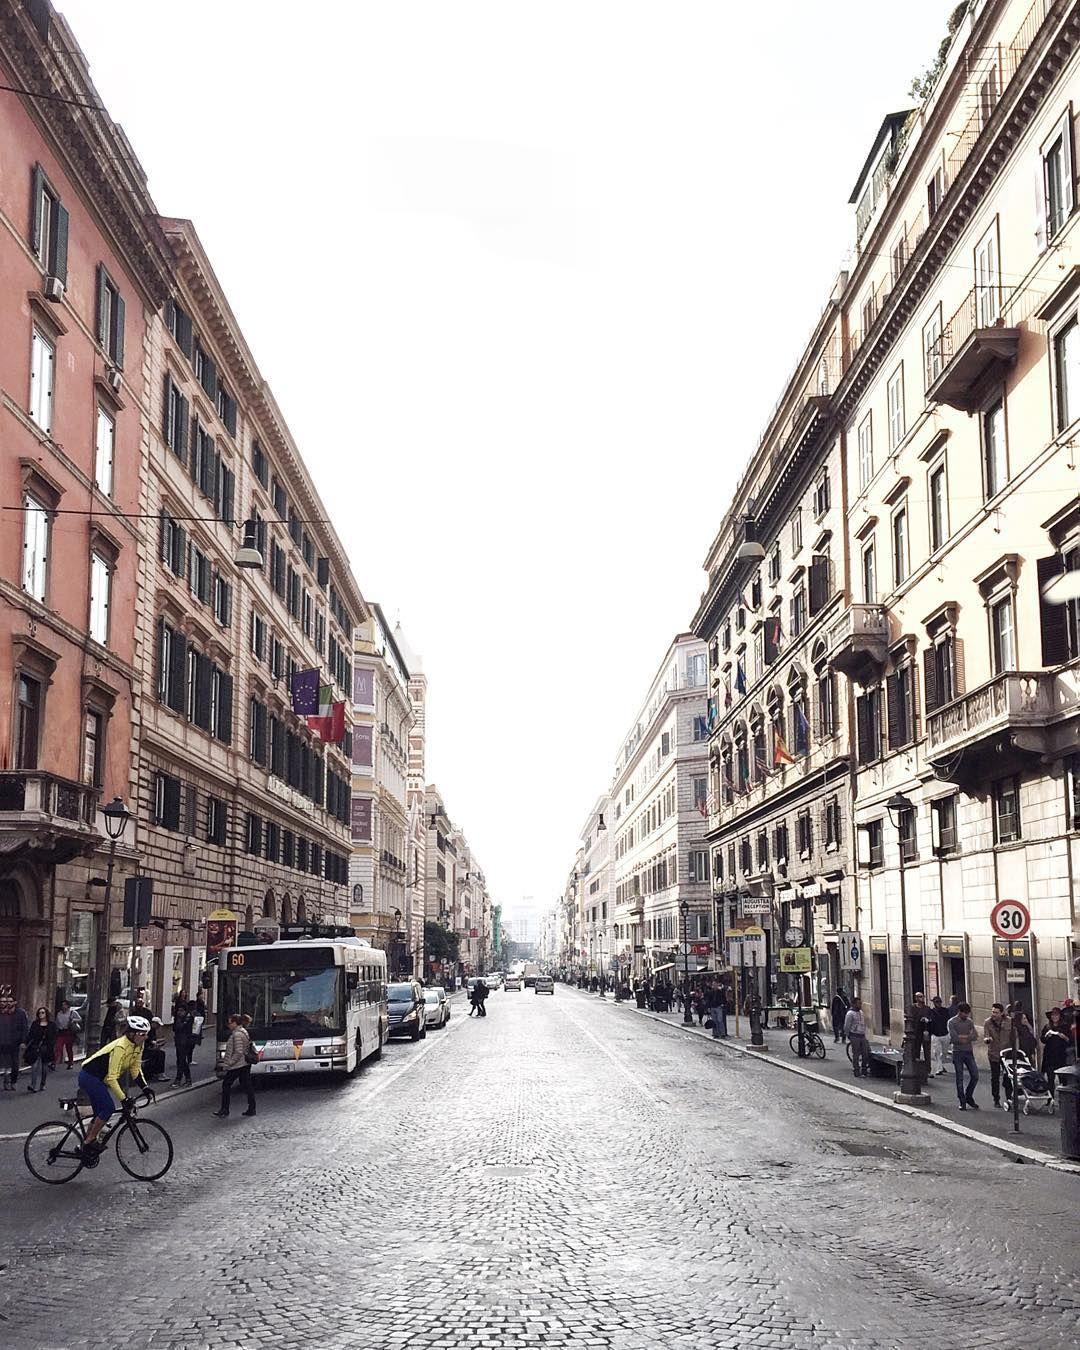 The great beauty of #Rome   W/ @daniele.vergari @davidpinto_